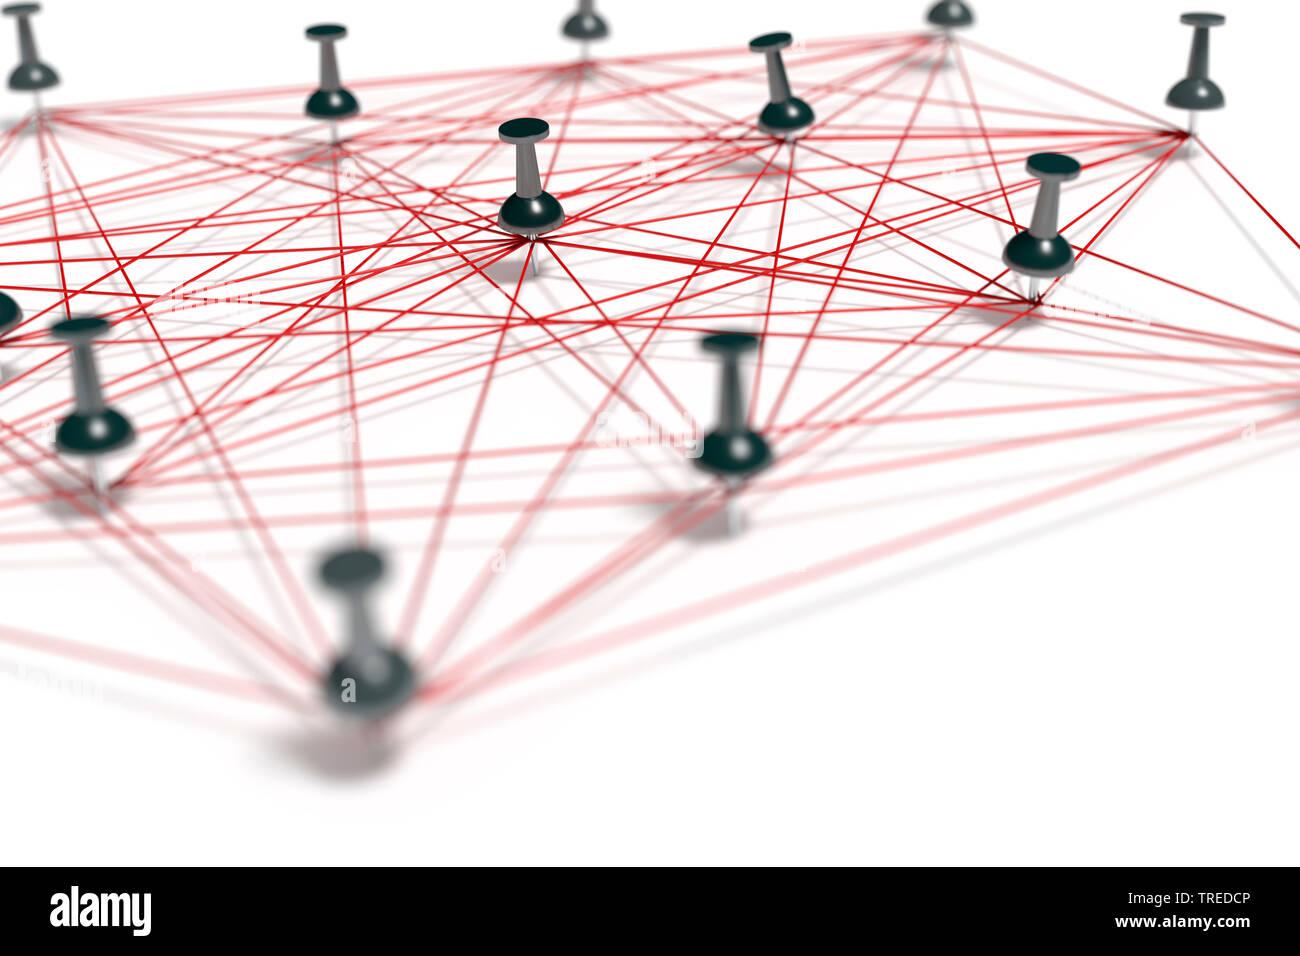 Nadeln mit rotem Faden verbunden, ein Netzwerk symbolisierend   Pins connected with red twines, symbolizing a network structure    BLWS523588.jpg [ (c - Stock Image